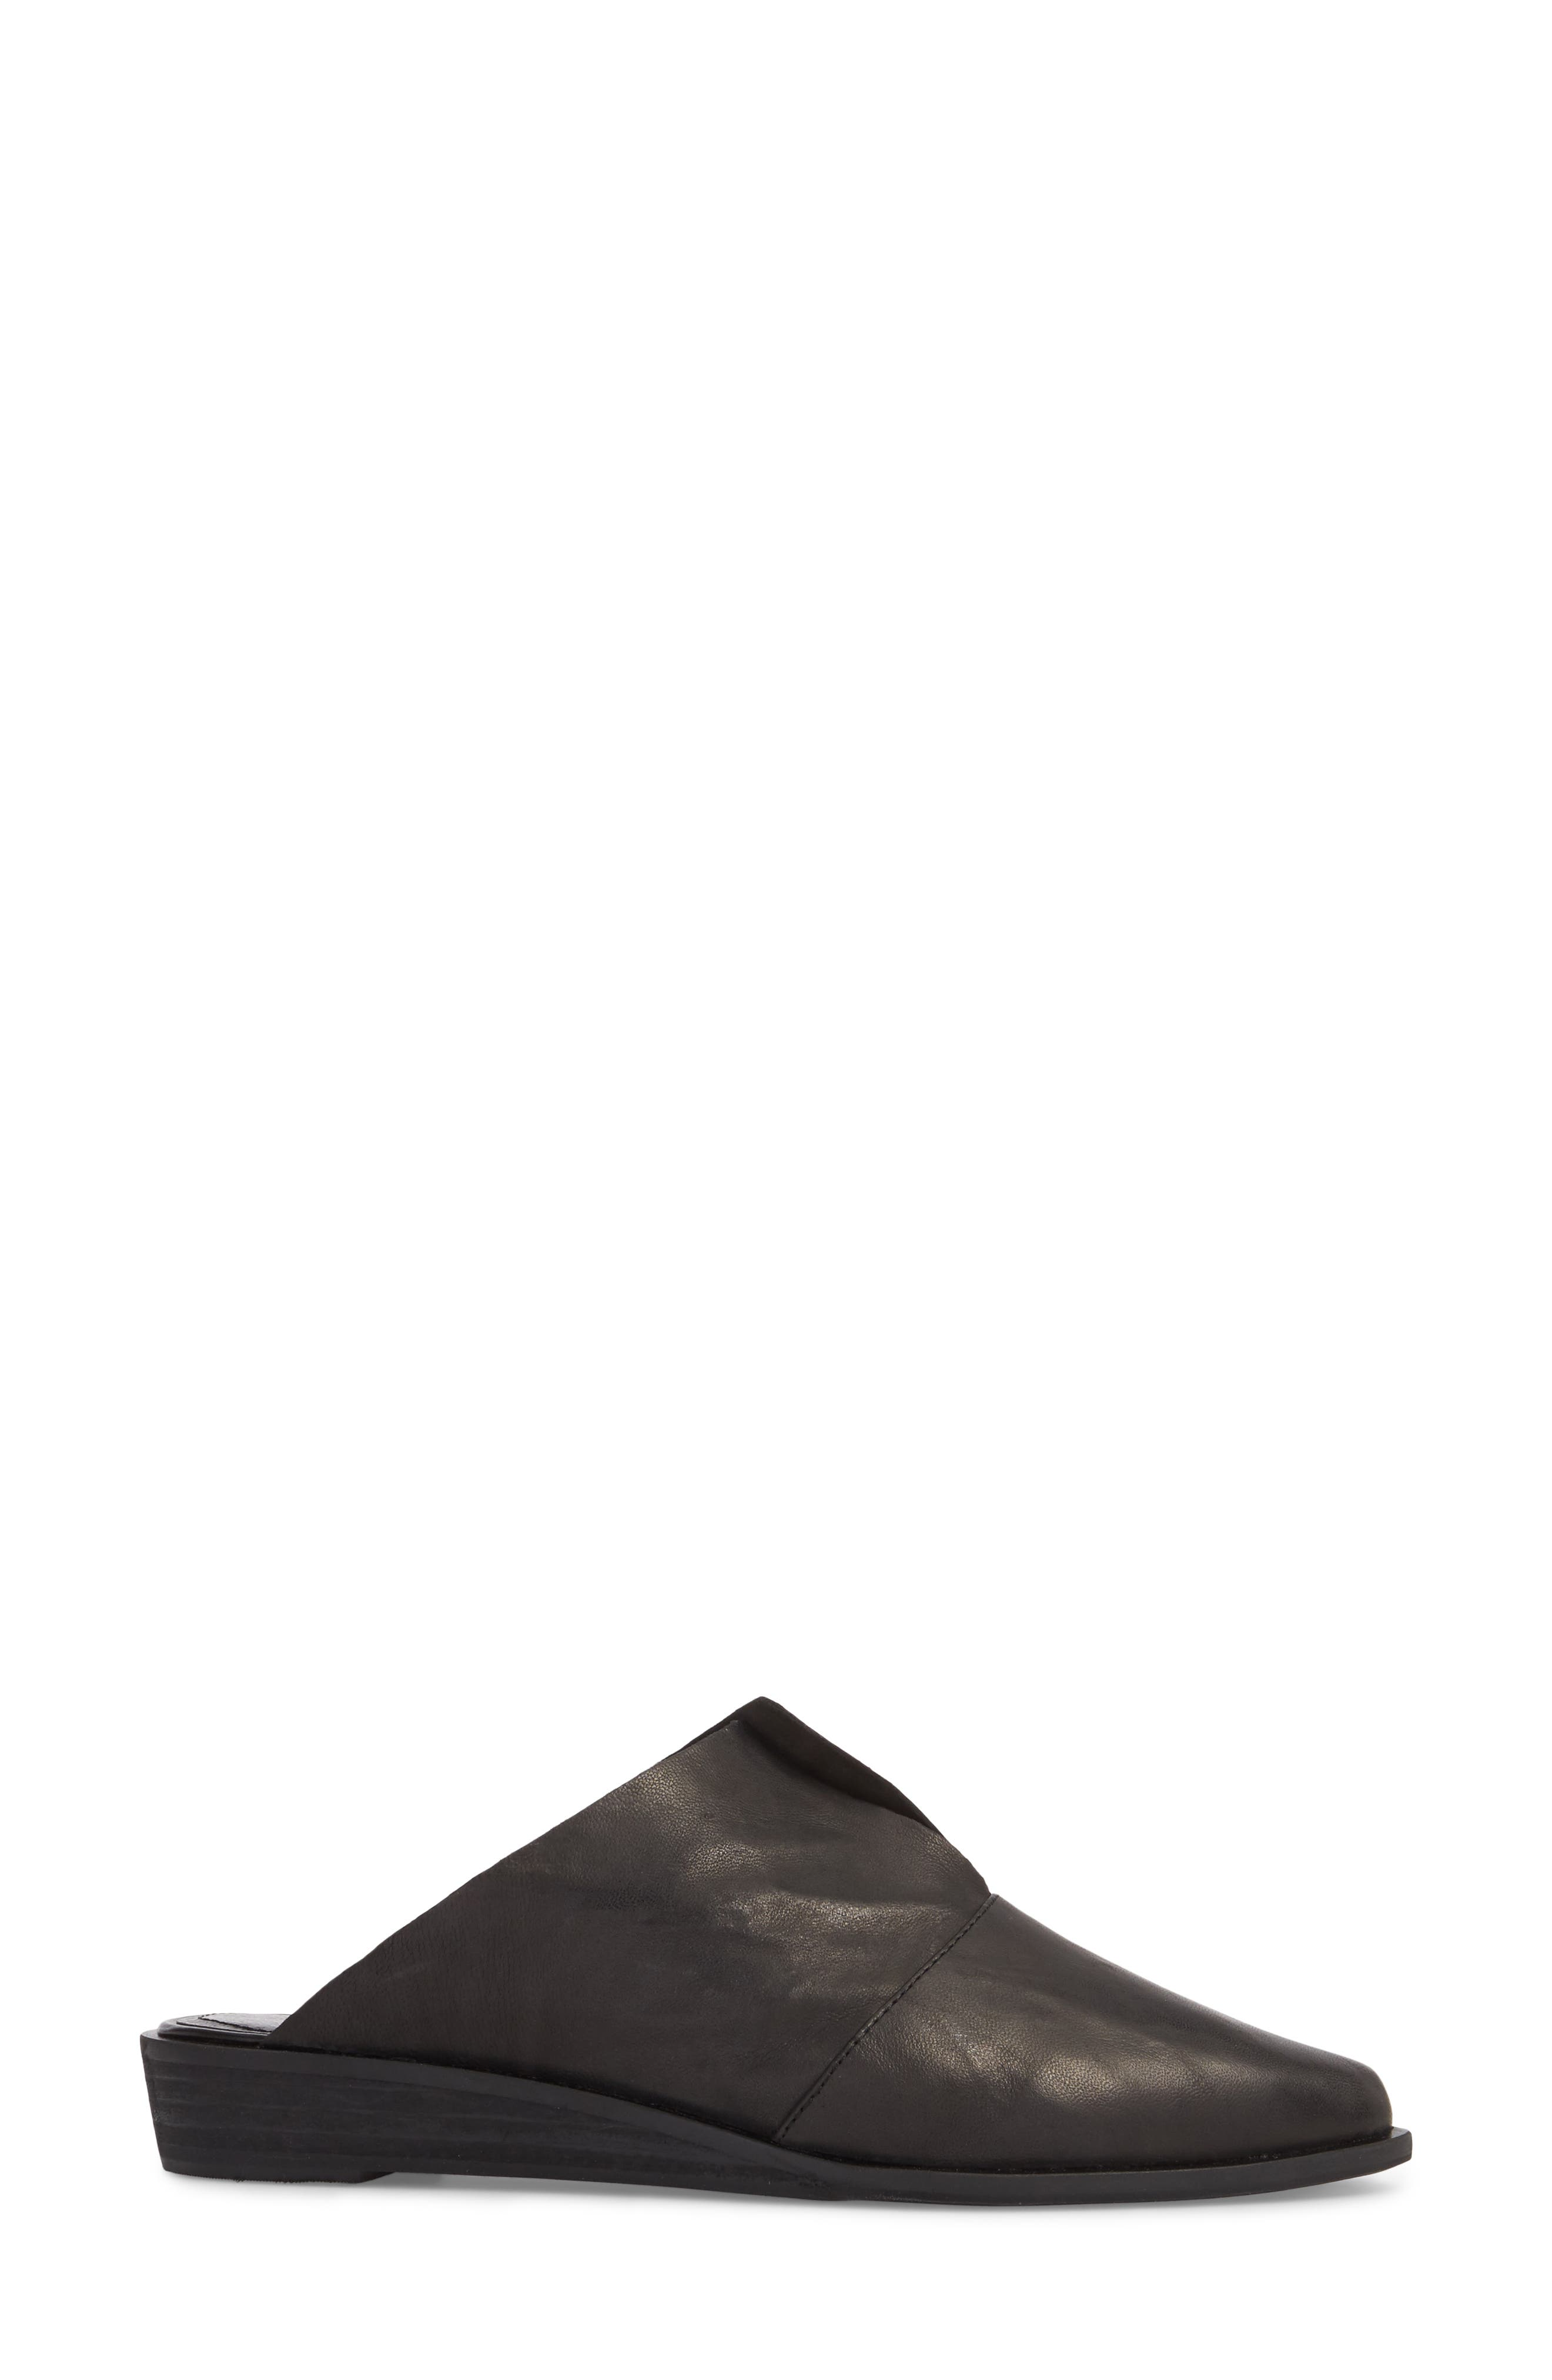 Ashland Mule,                             Alternate thumbnail 3, color,                             BLACK LEATHER